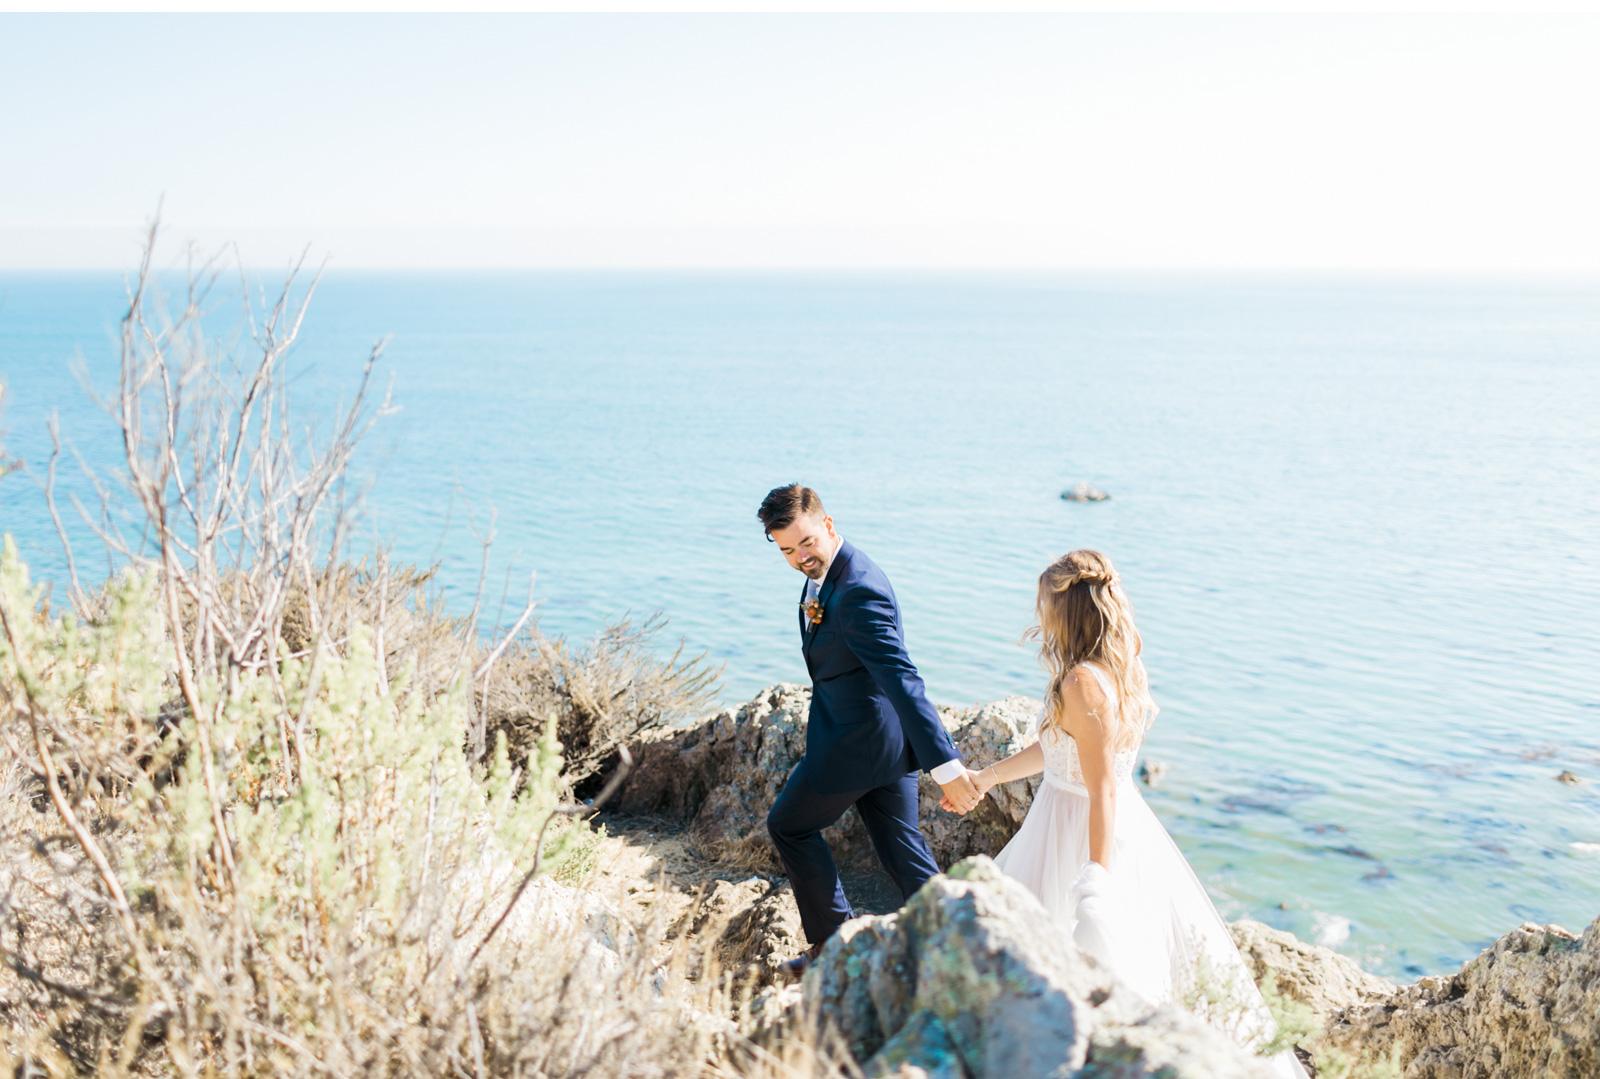 Avila-Beach-Wedding-Style-Me-Pretty-Natalie-Schutt-Photography_18.jpg